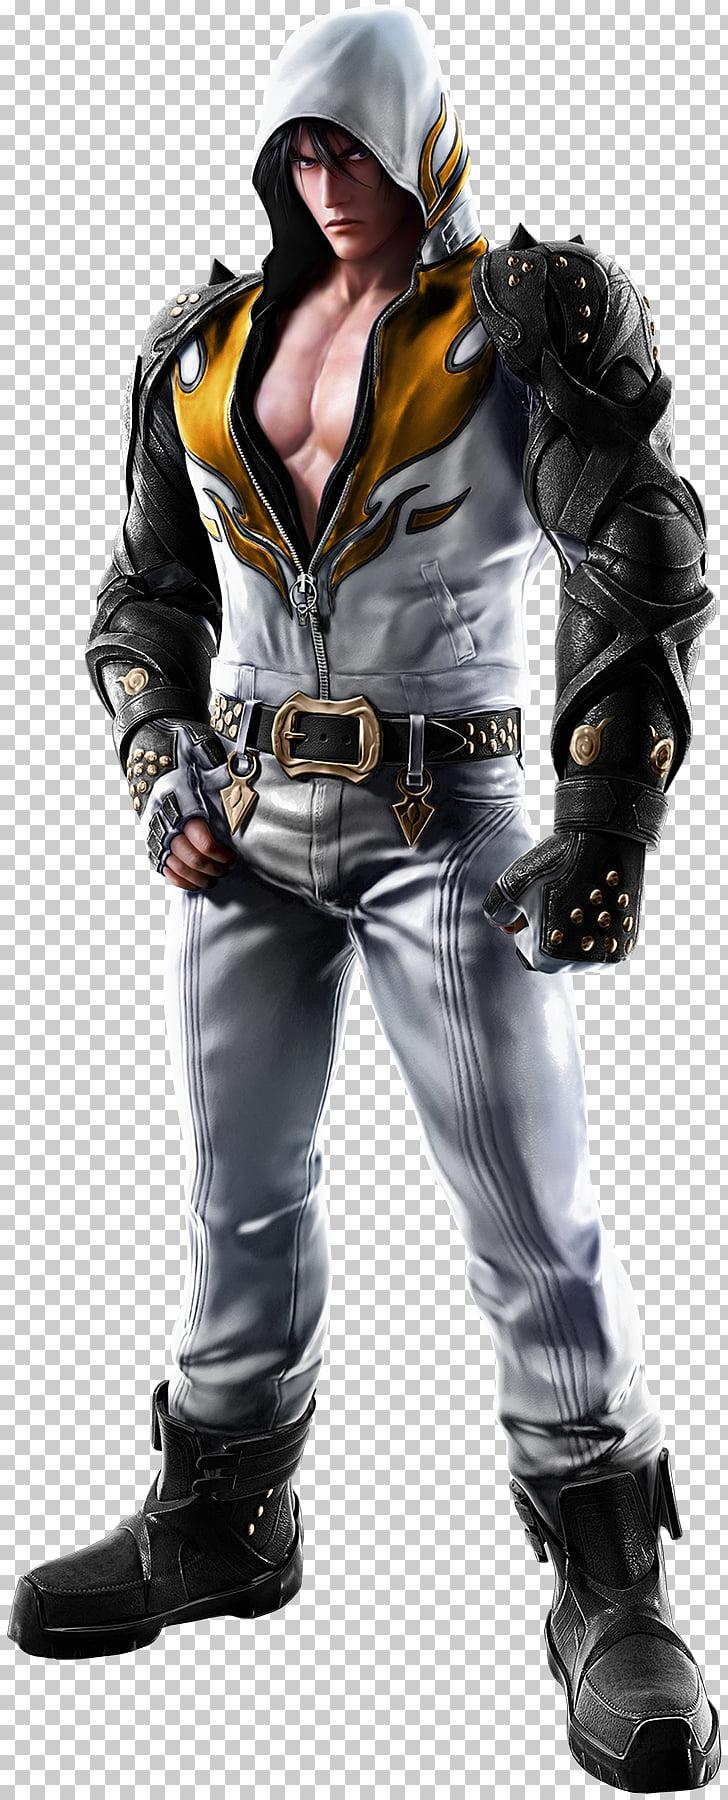 Jin Kazama Tekken 7 Tekken 6 Kazuya Mishima Ling Xiaoyu,.